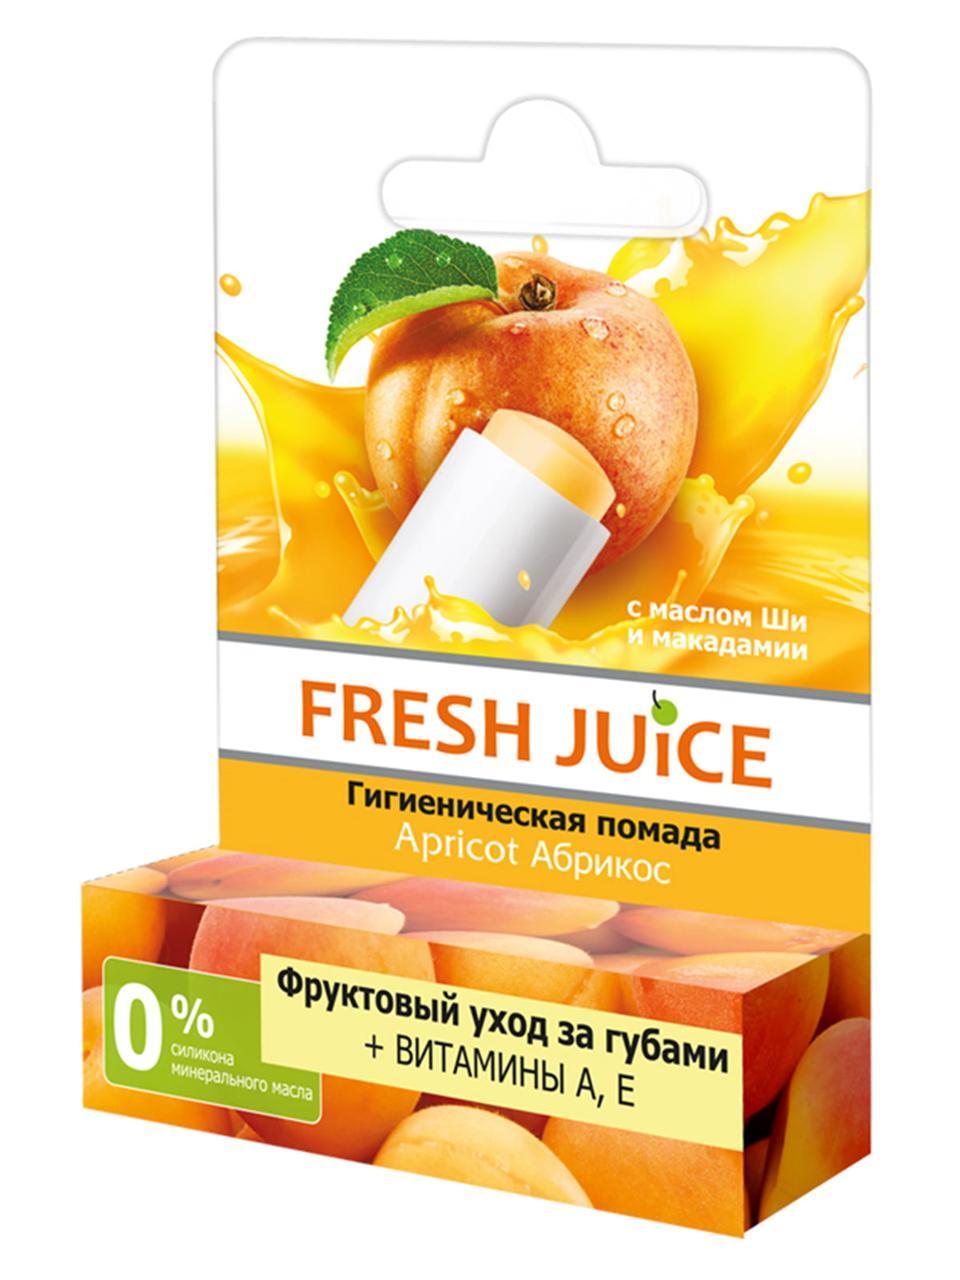 Помада коробка  Apricot